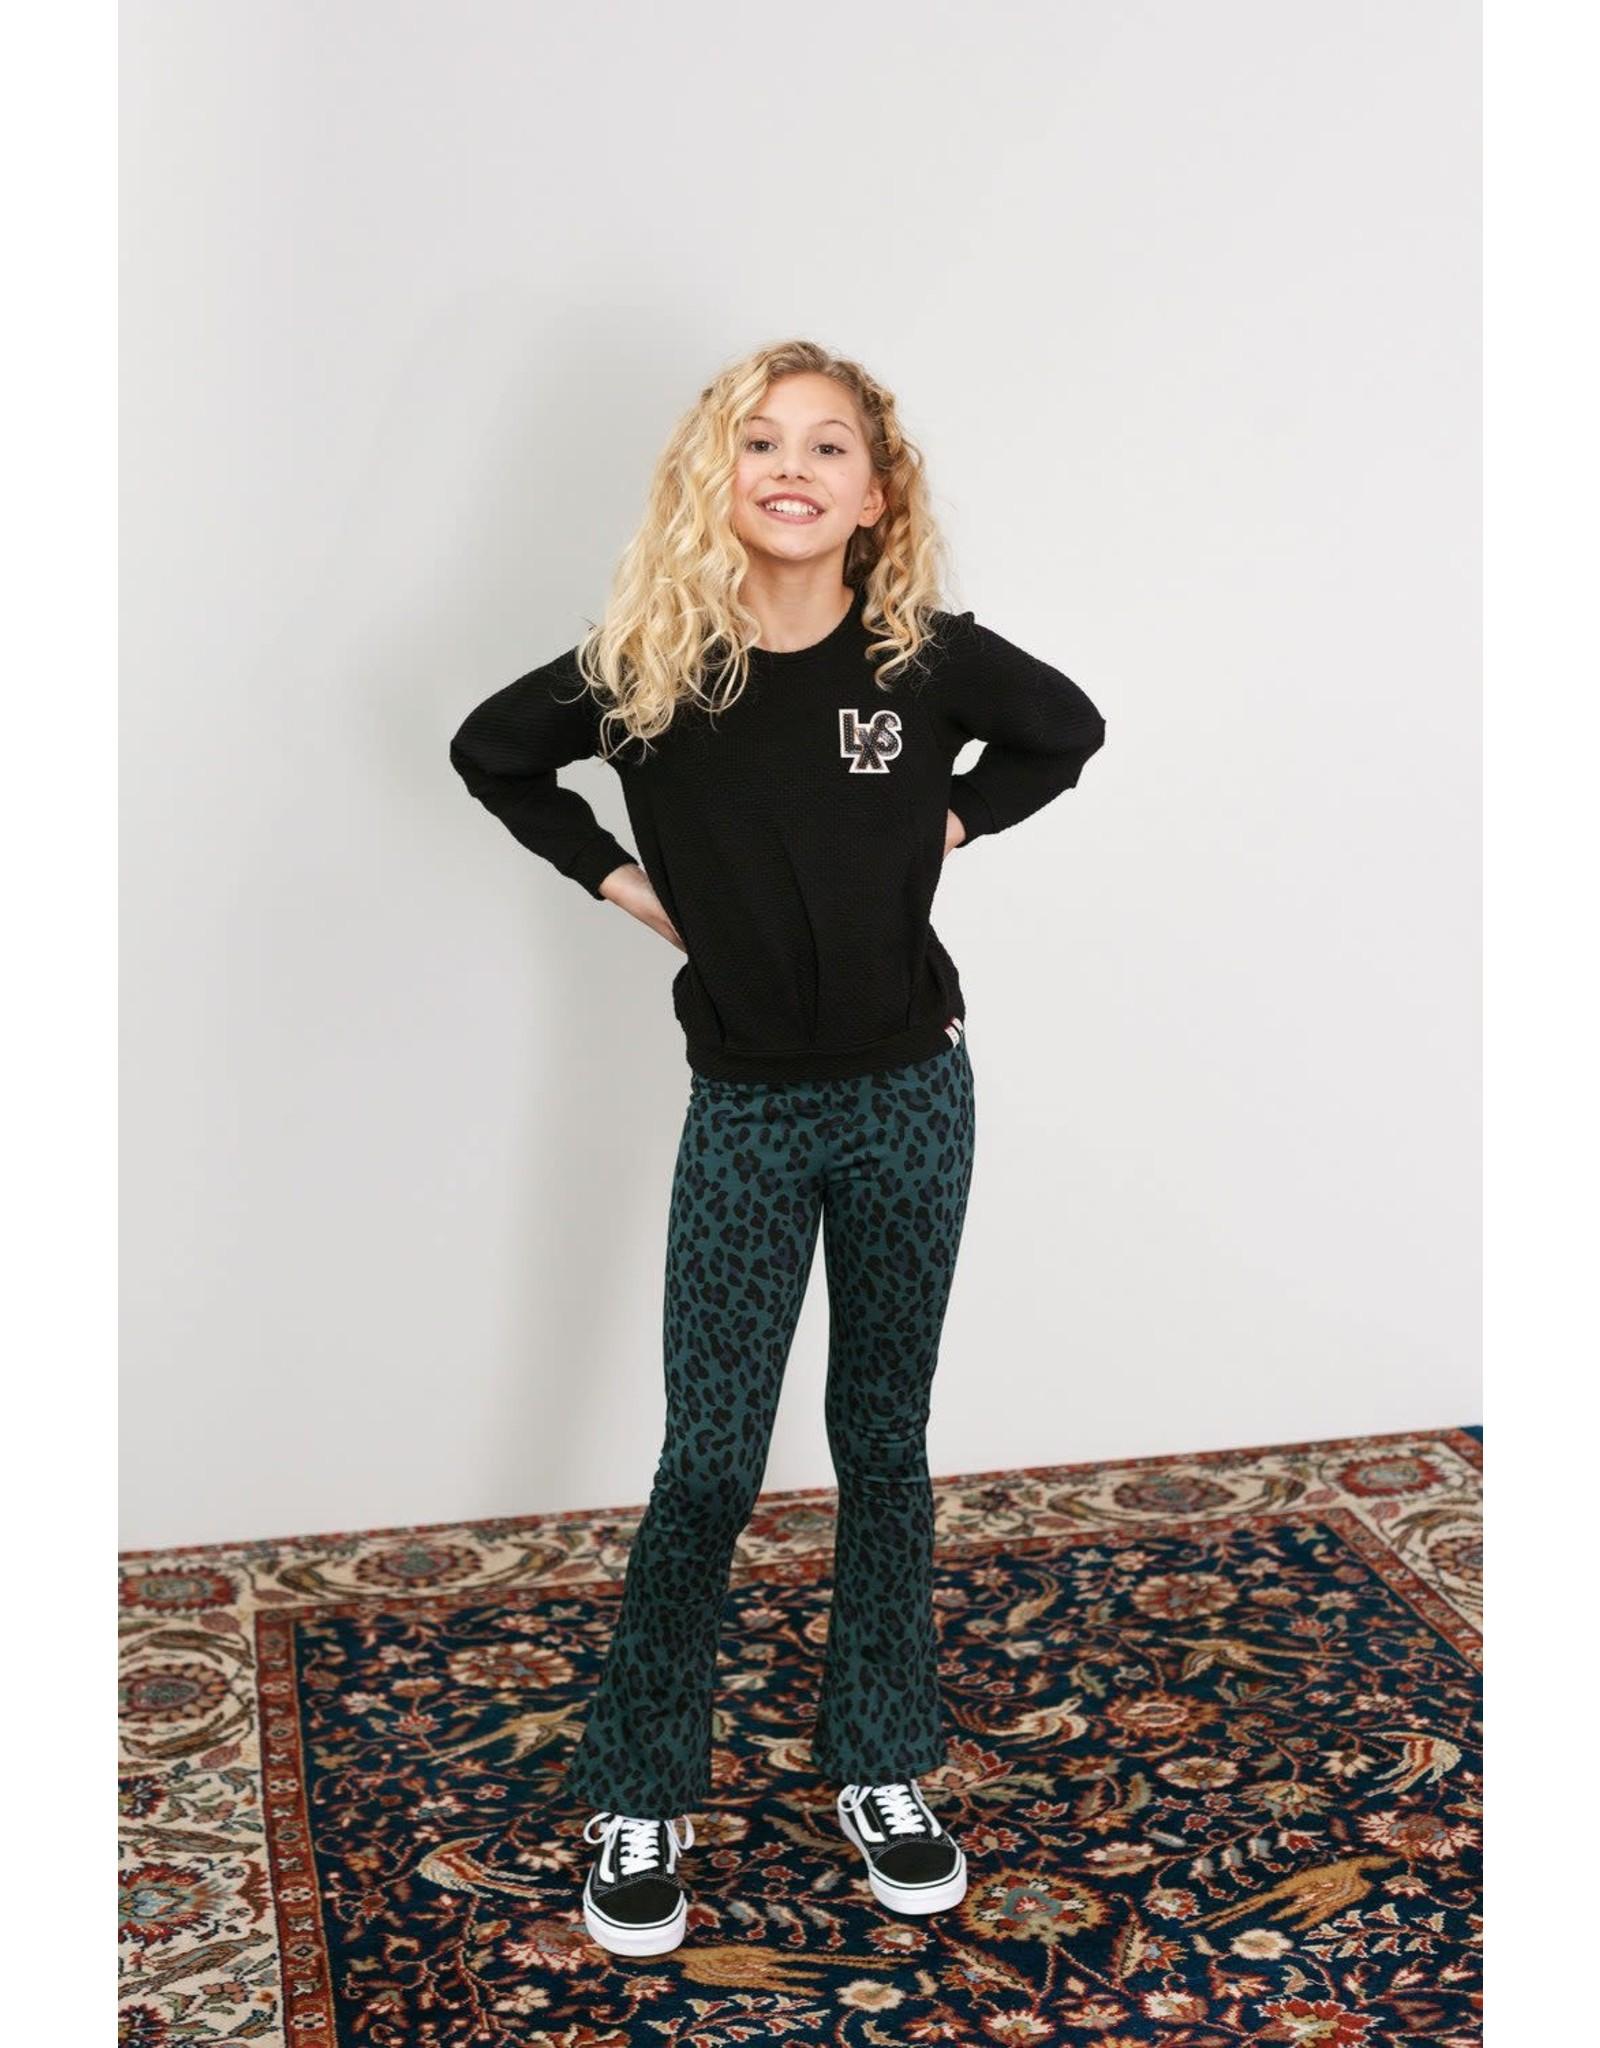 Looxs Girls sweater Black